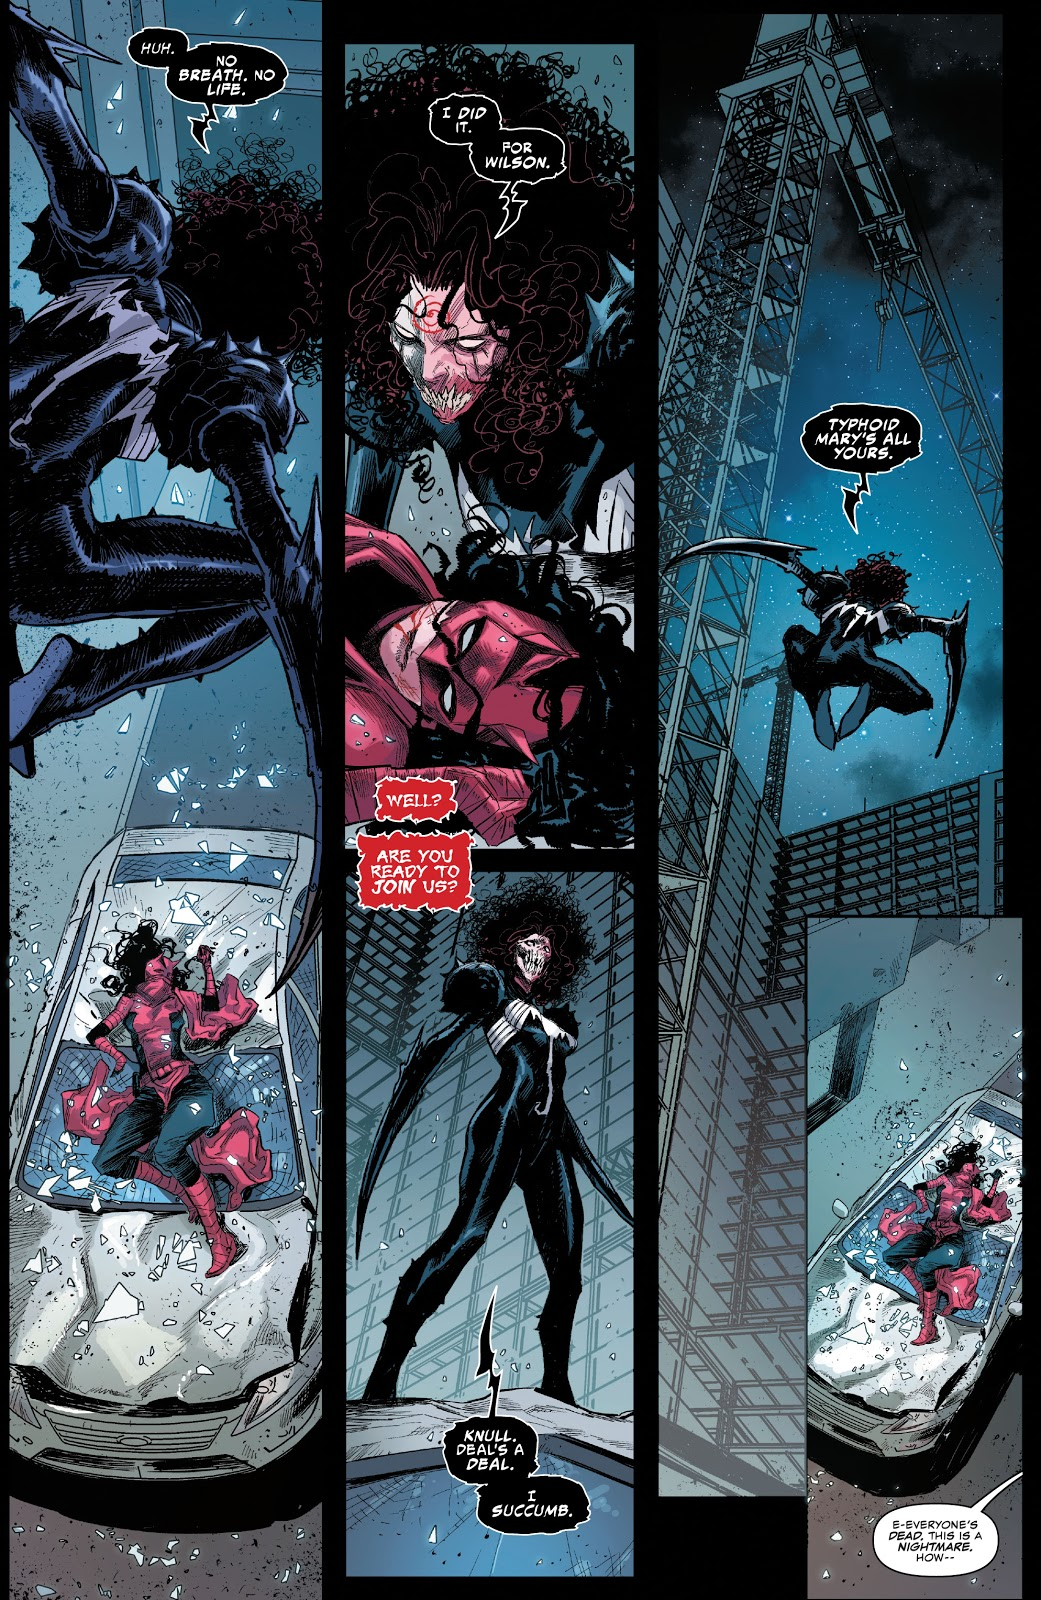 Daredevil (Elektra) VS Symbiote Typhoid Mary